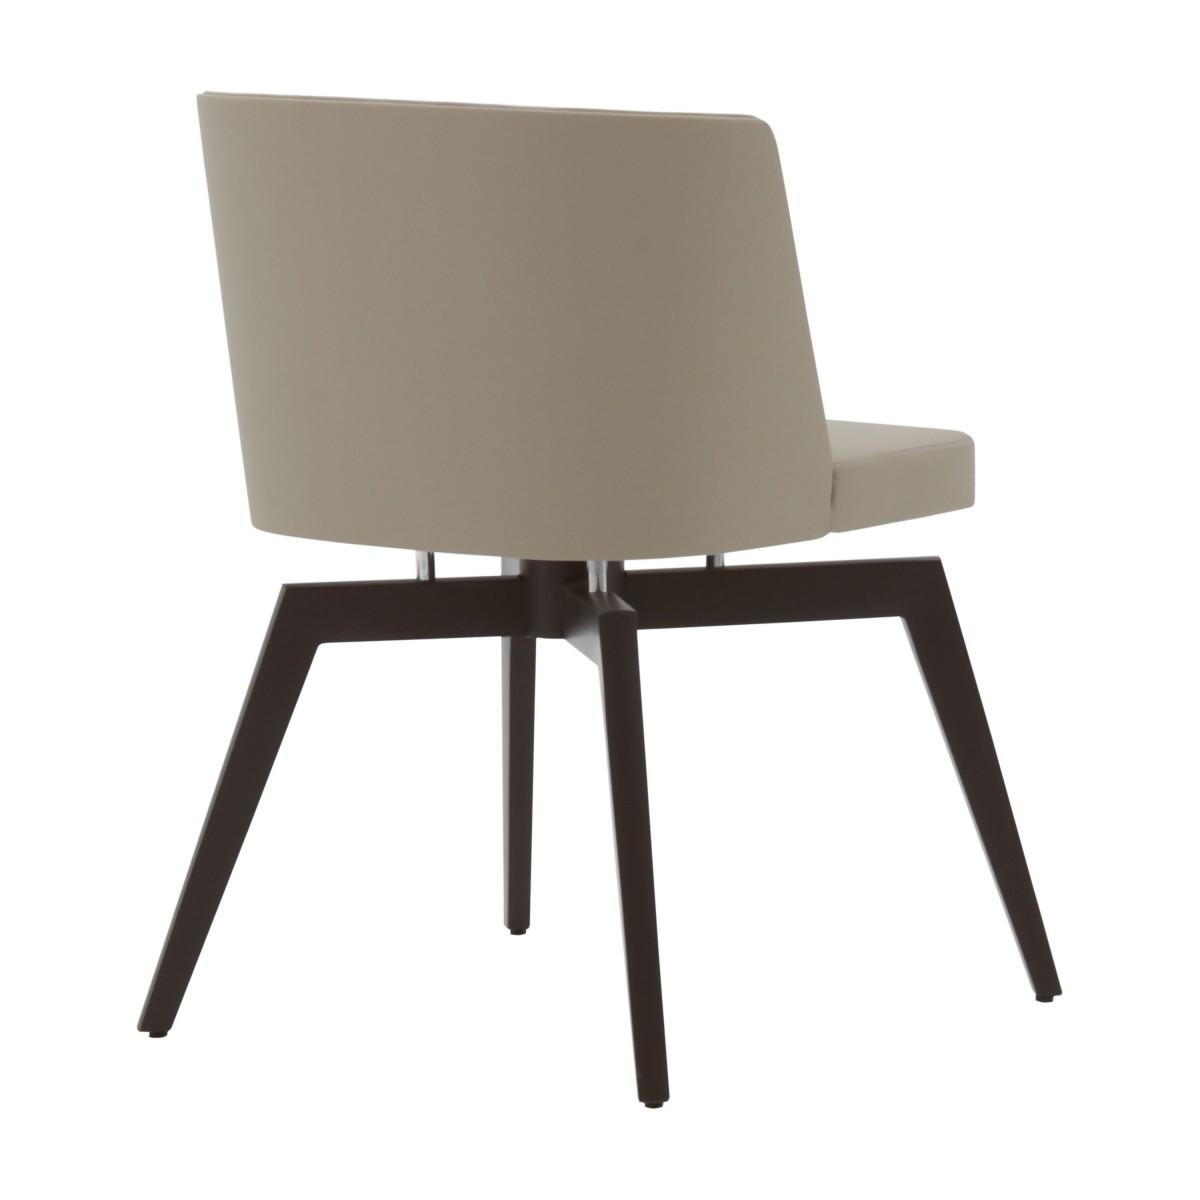 italian modern chair marta 1 9480